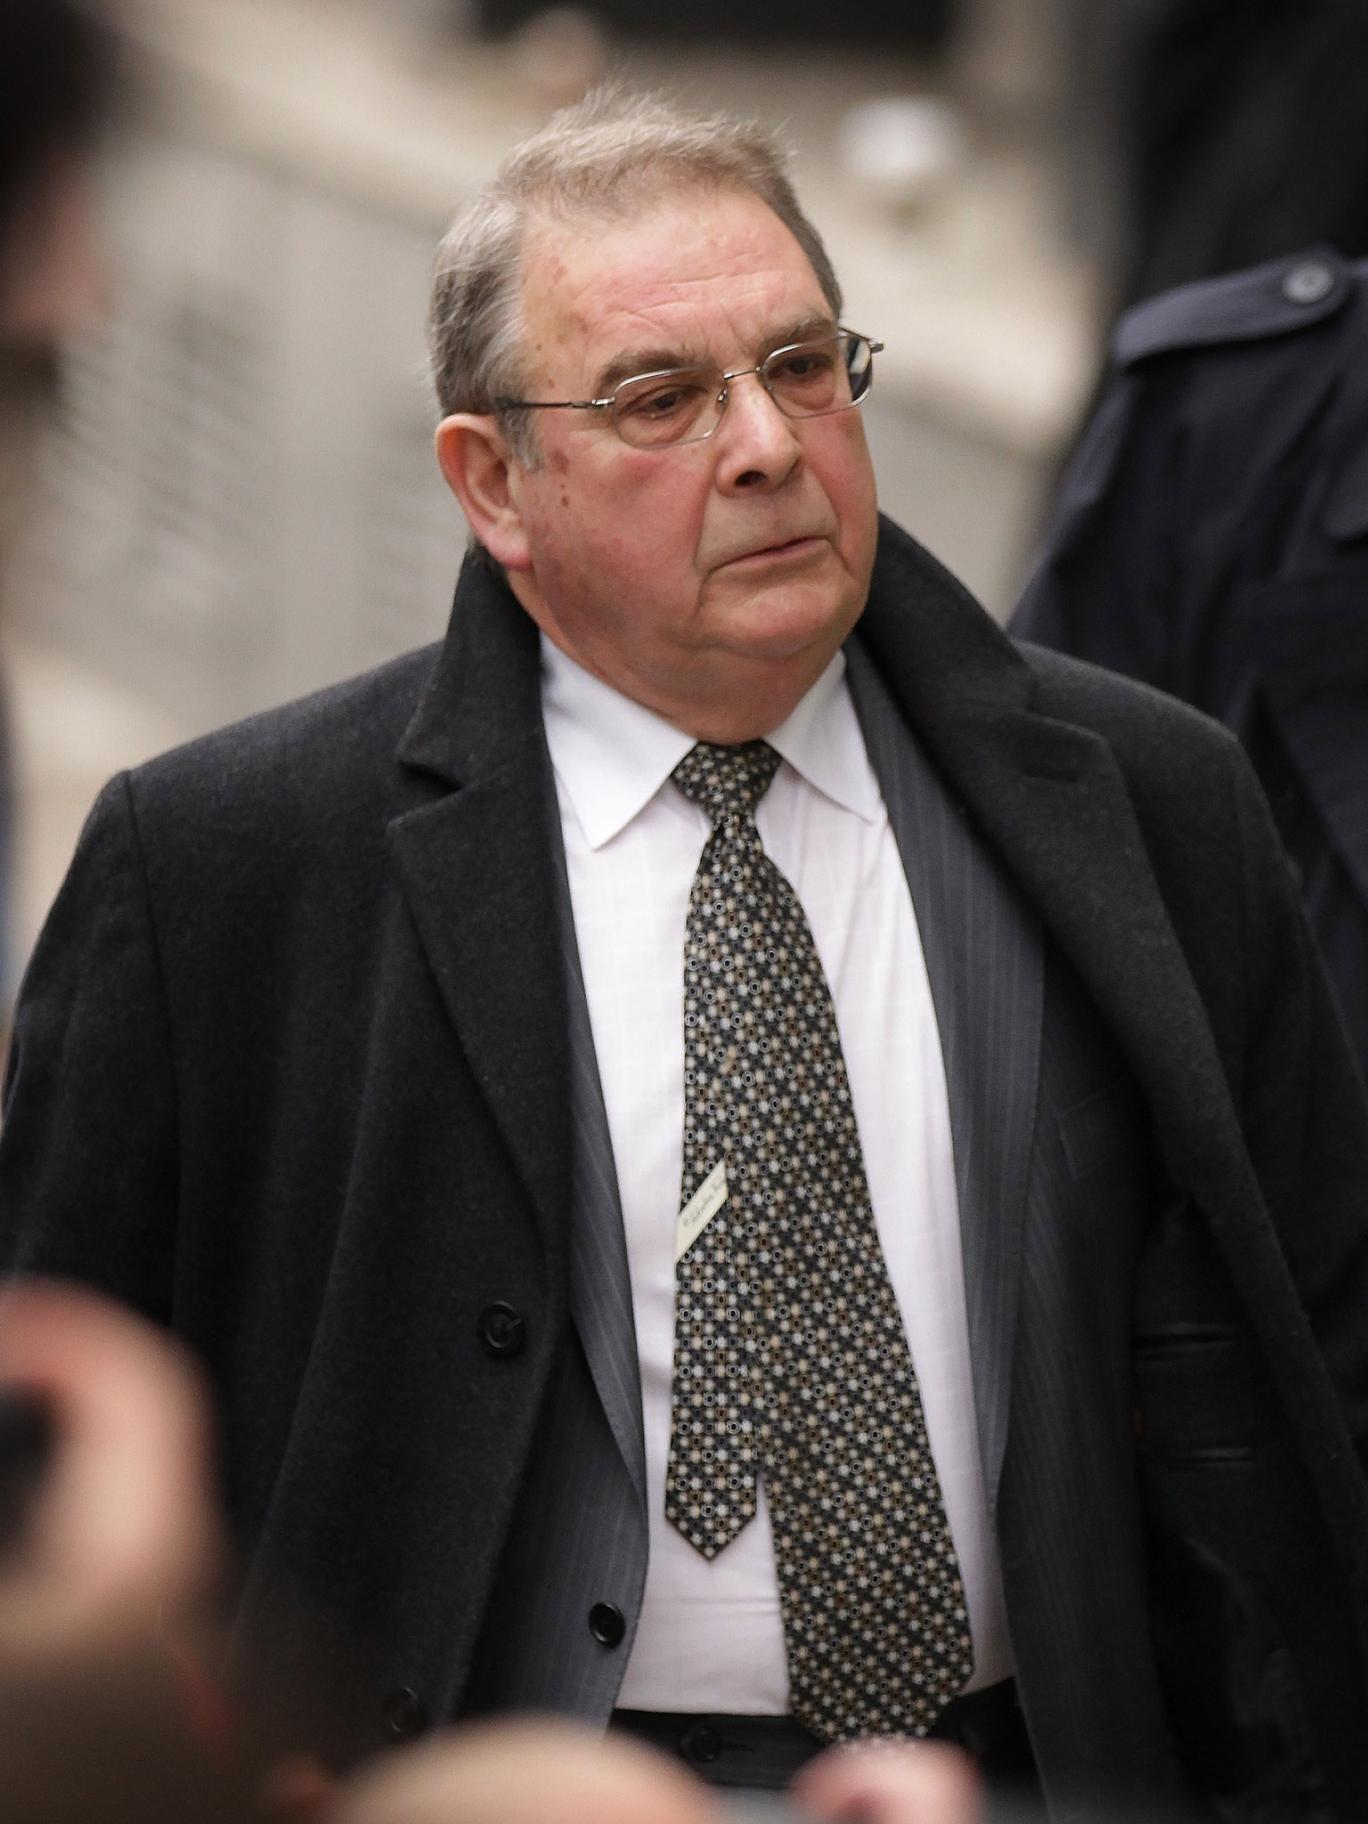 Conservative Peer Lord Hanningfield